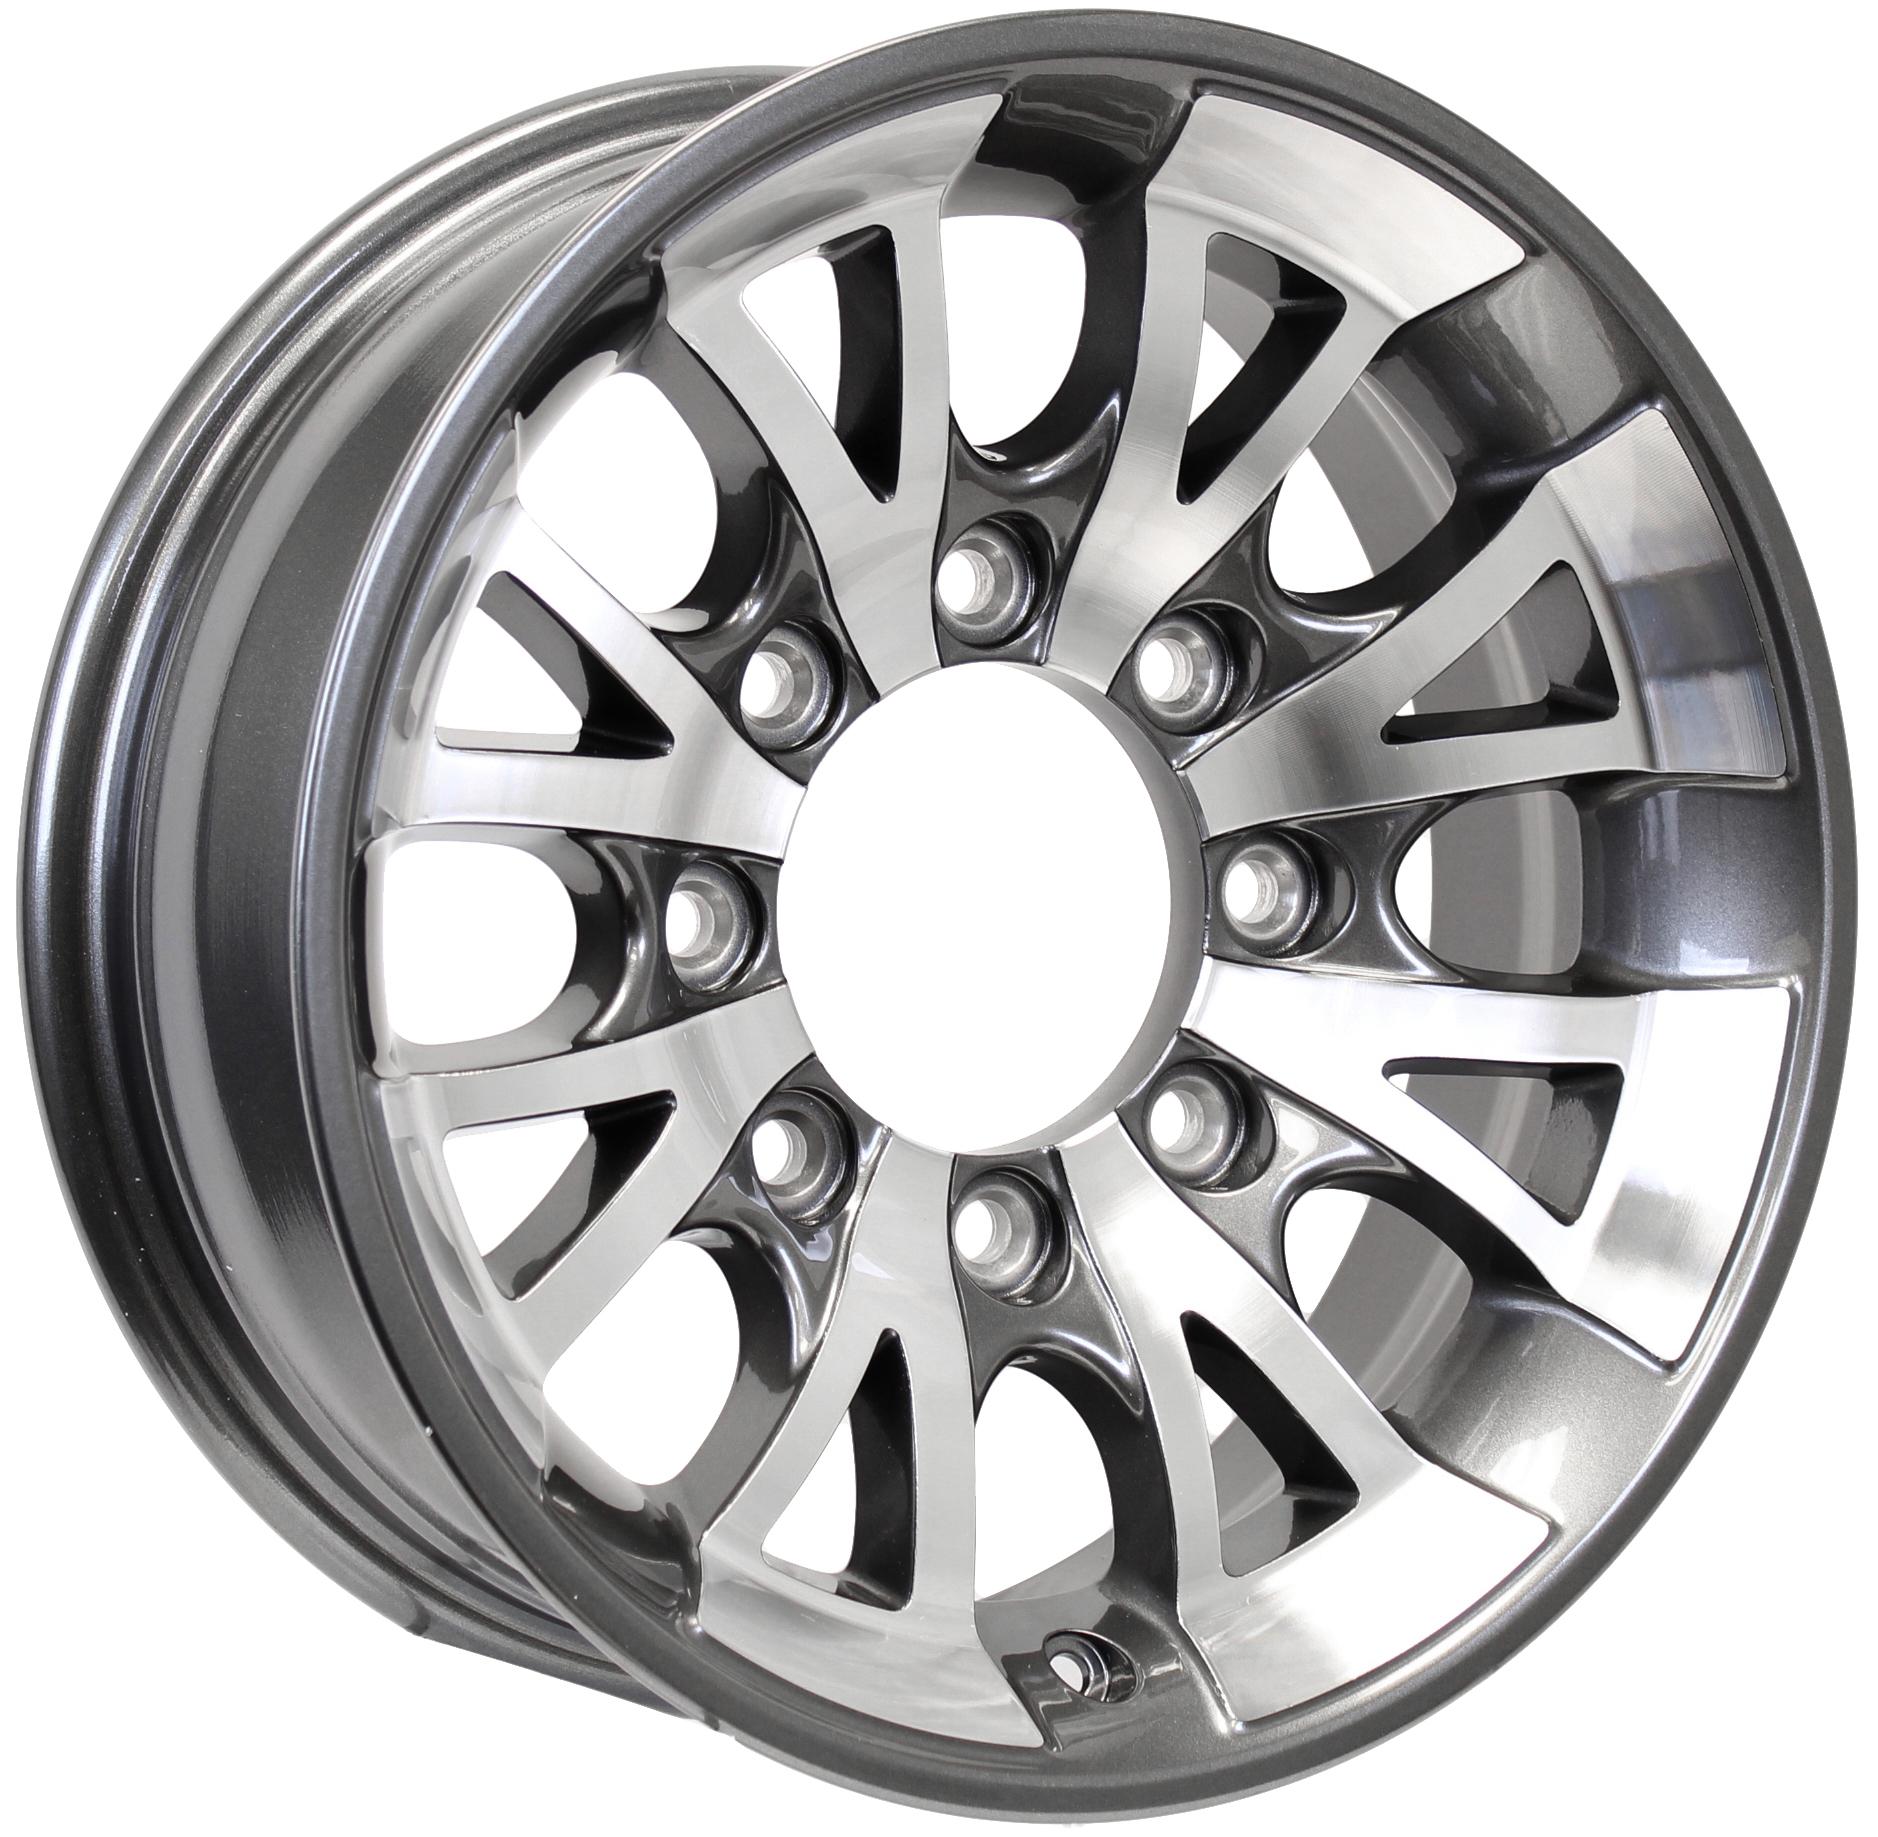 A1411 16x6; 8-Lug Gun Metal Aluminum Trailer Wheel Image